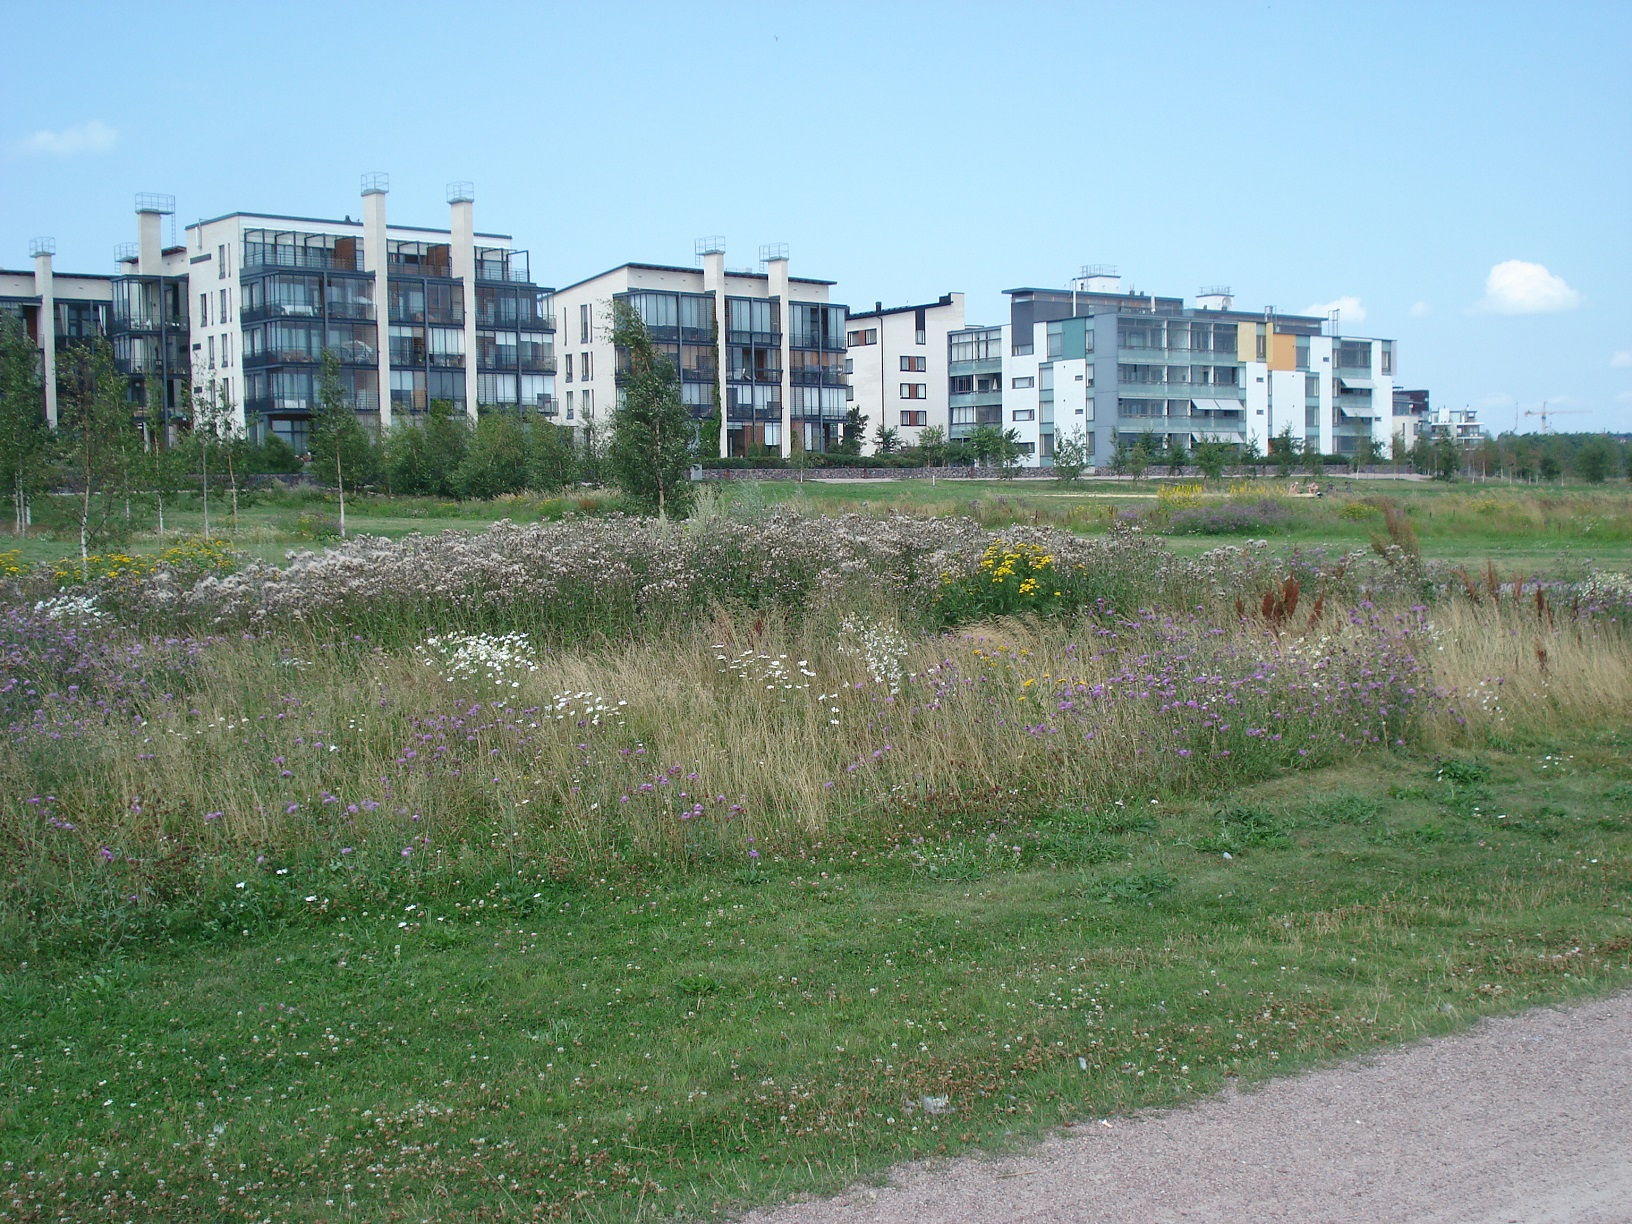 Helsinki Arabianranta